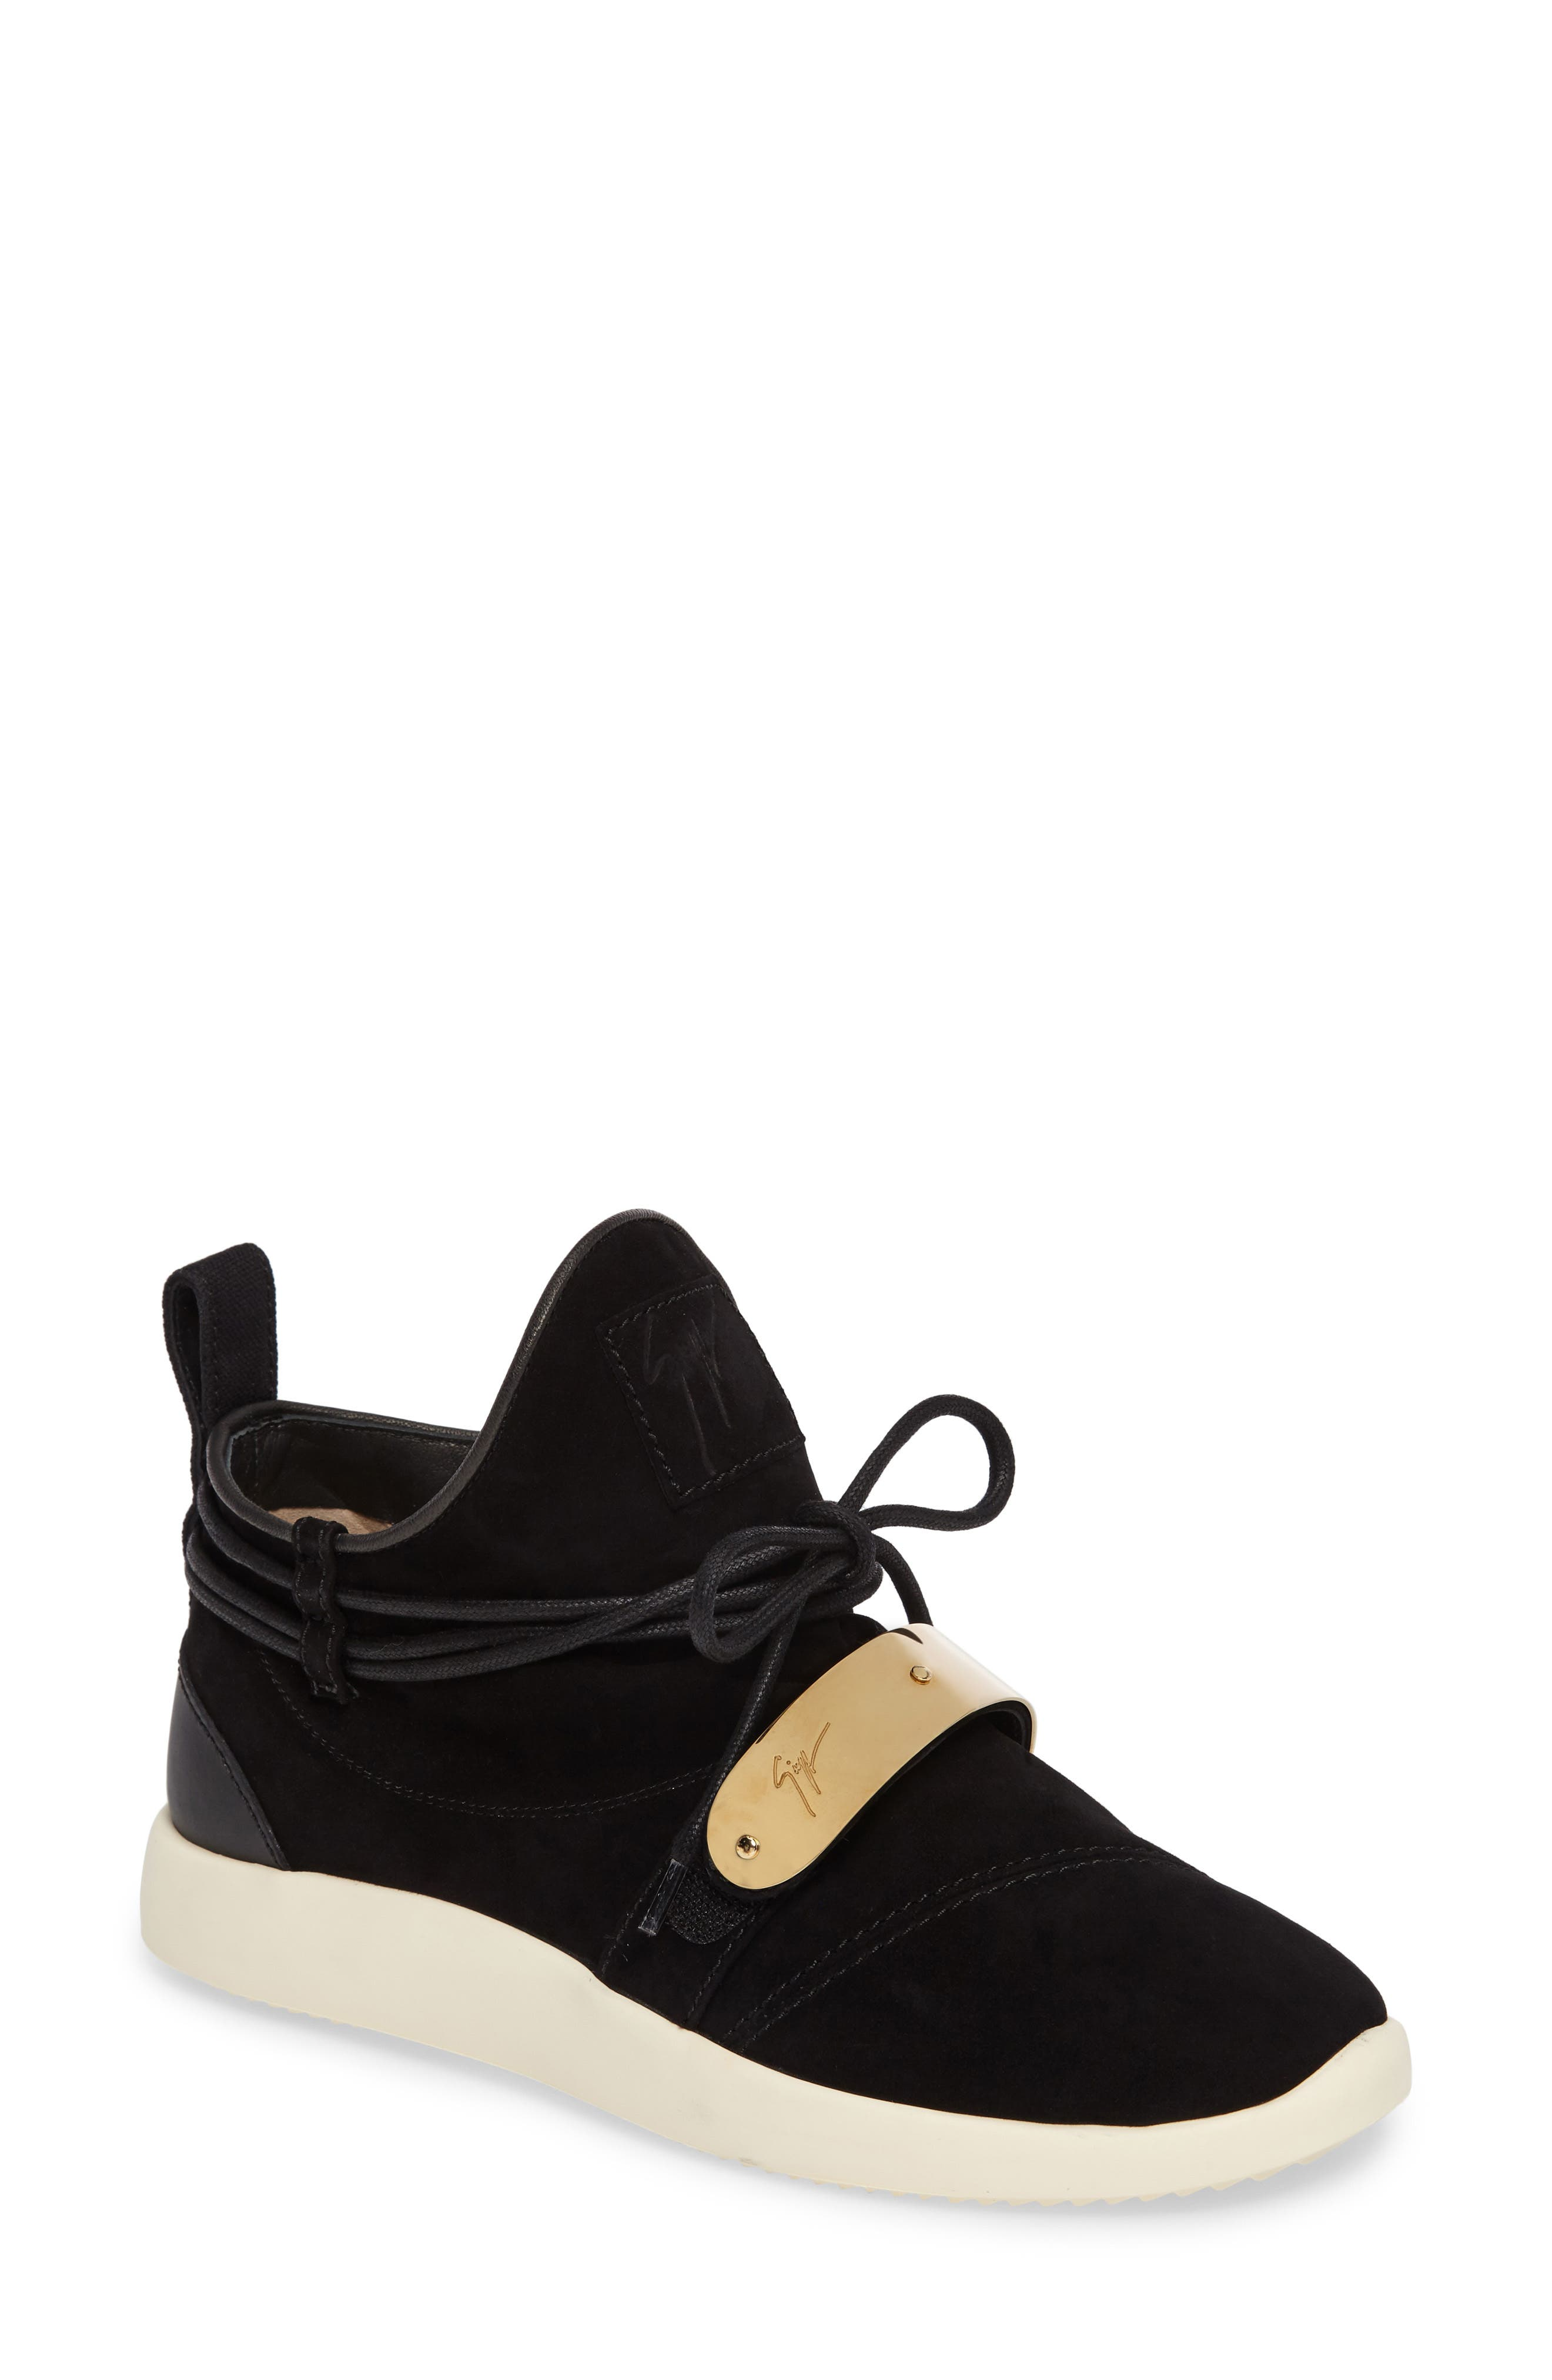 Gold Band Sneaker,                             Main thumbnail 1, color,                             Black